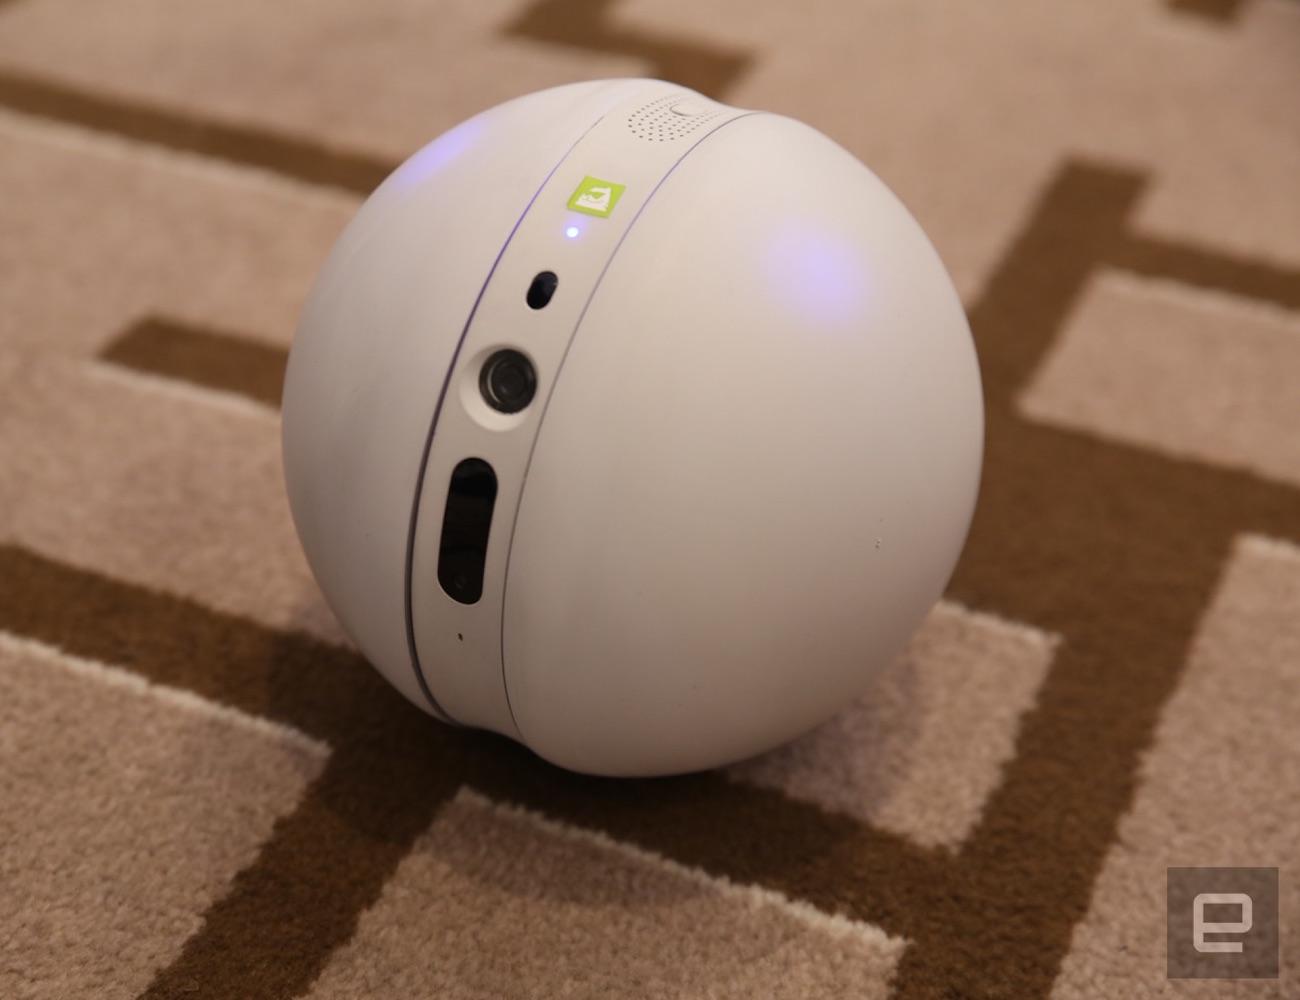 lg-robot-ball-02